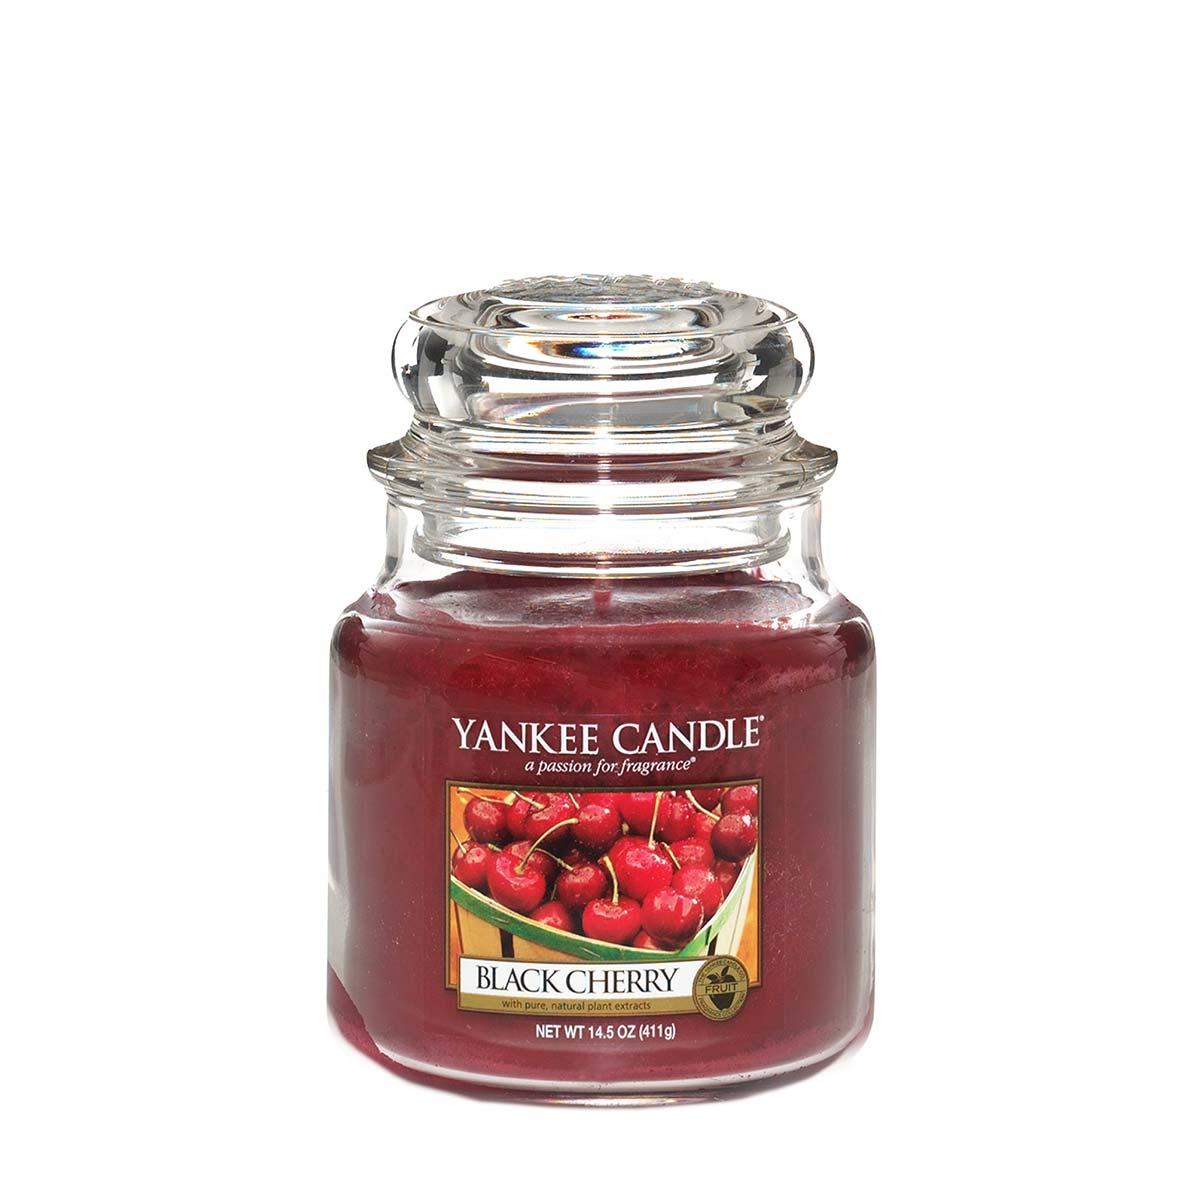 Yankee Candle Jar Medium Black Cherry